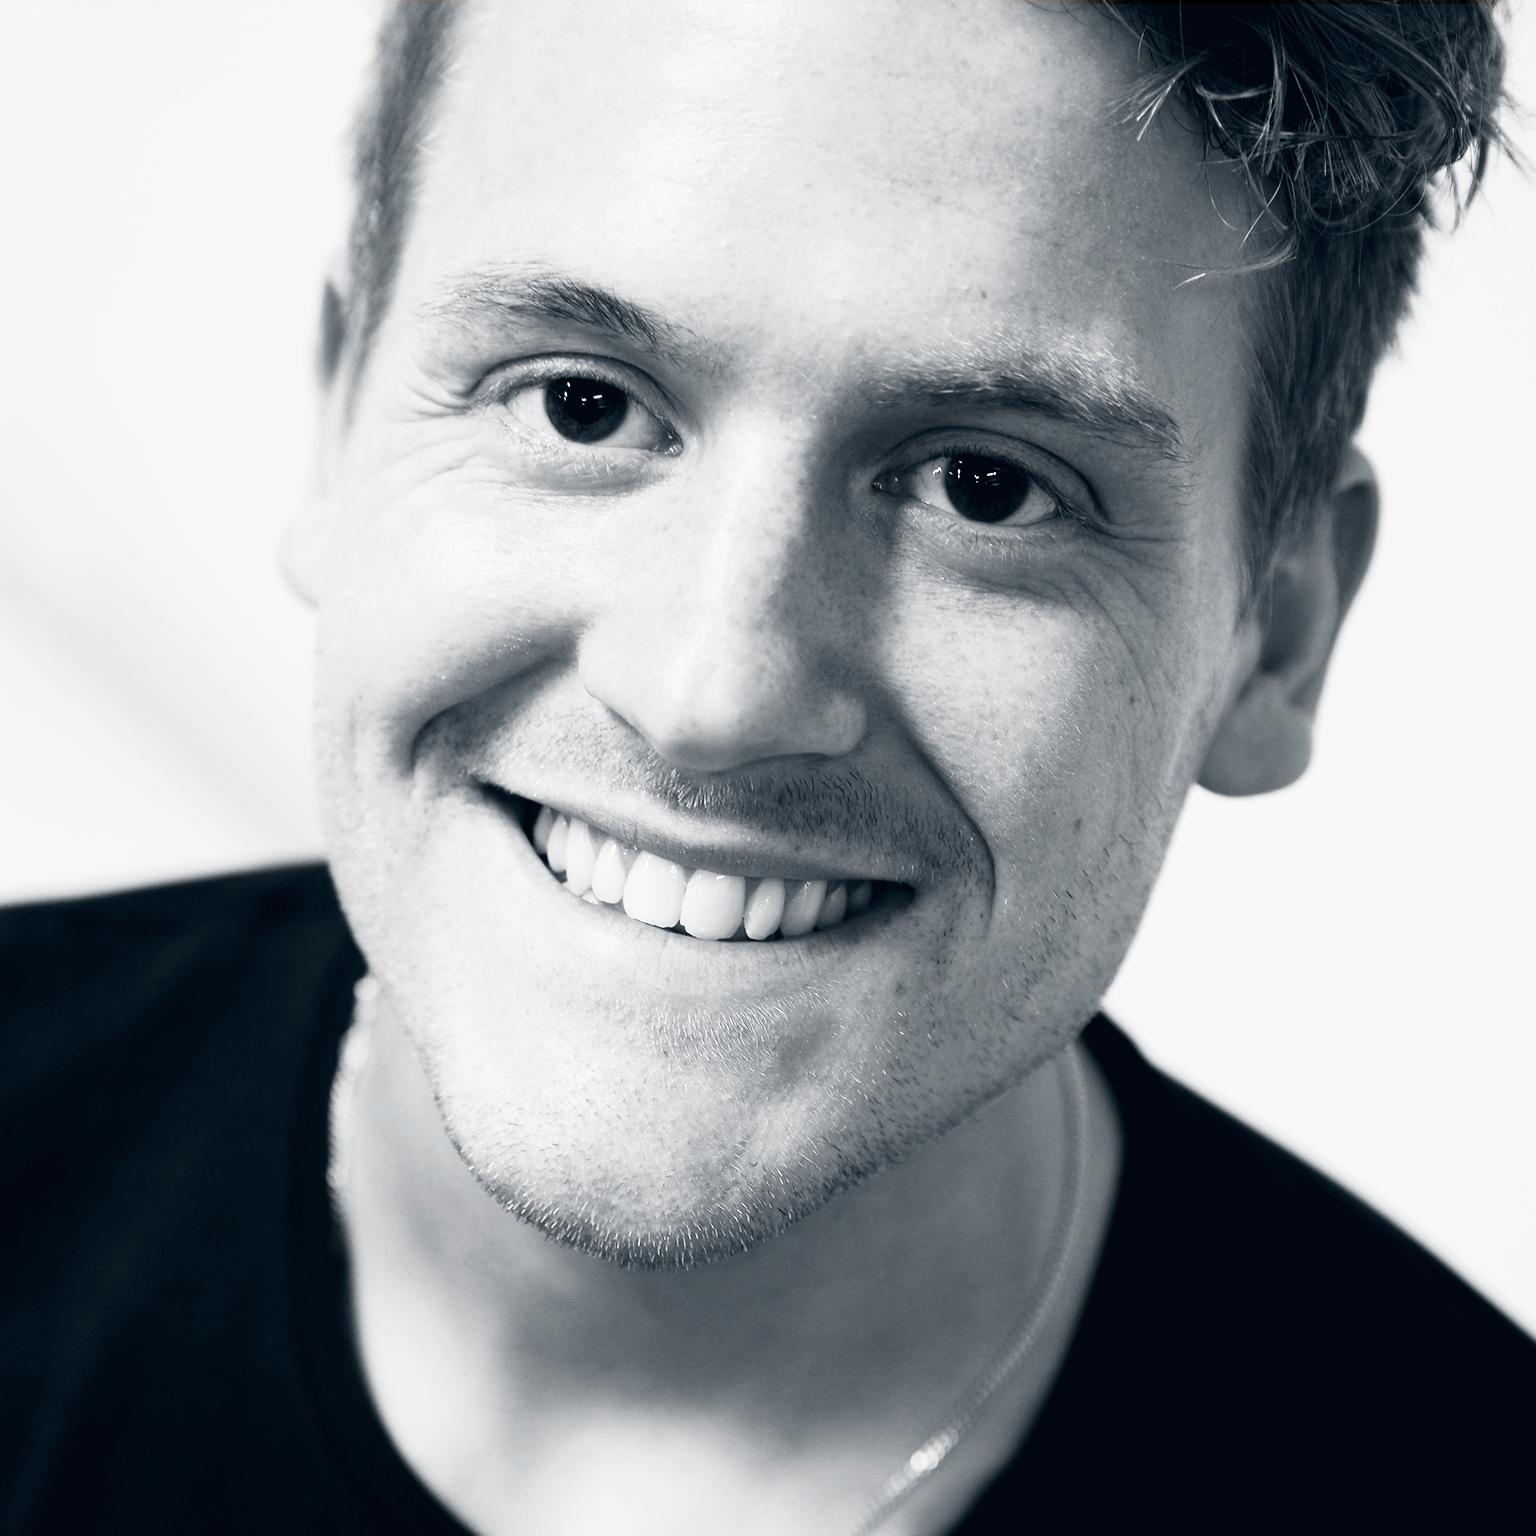 Marcus Gustafsson - Jobbar med montage av bland annat markiser & persienner i Jönköping